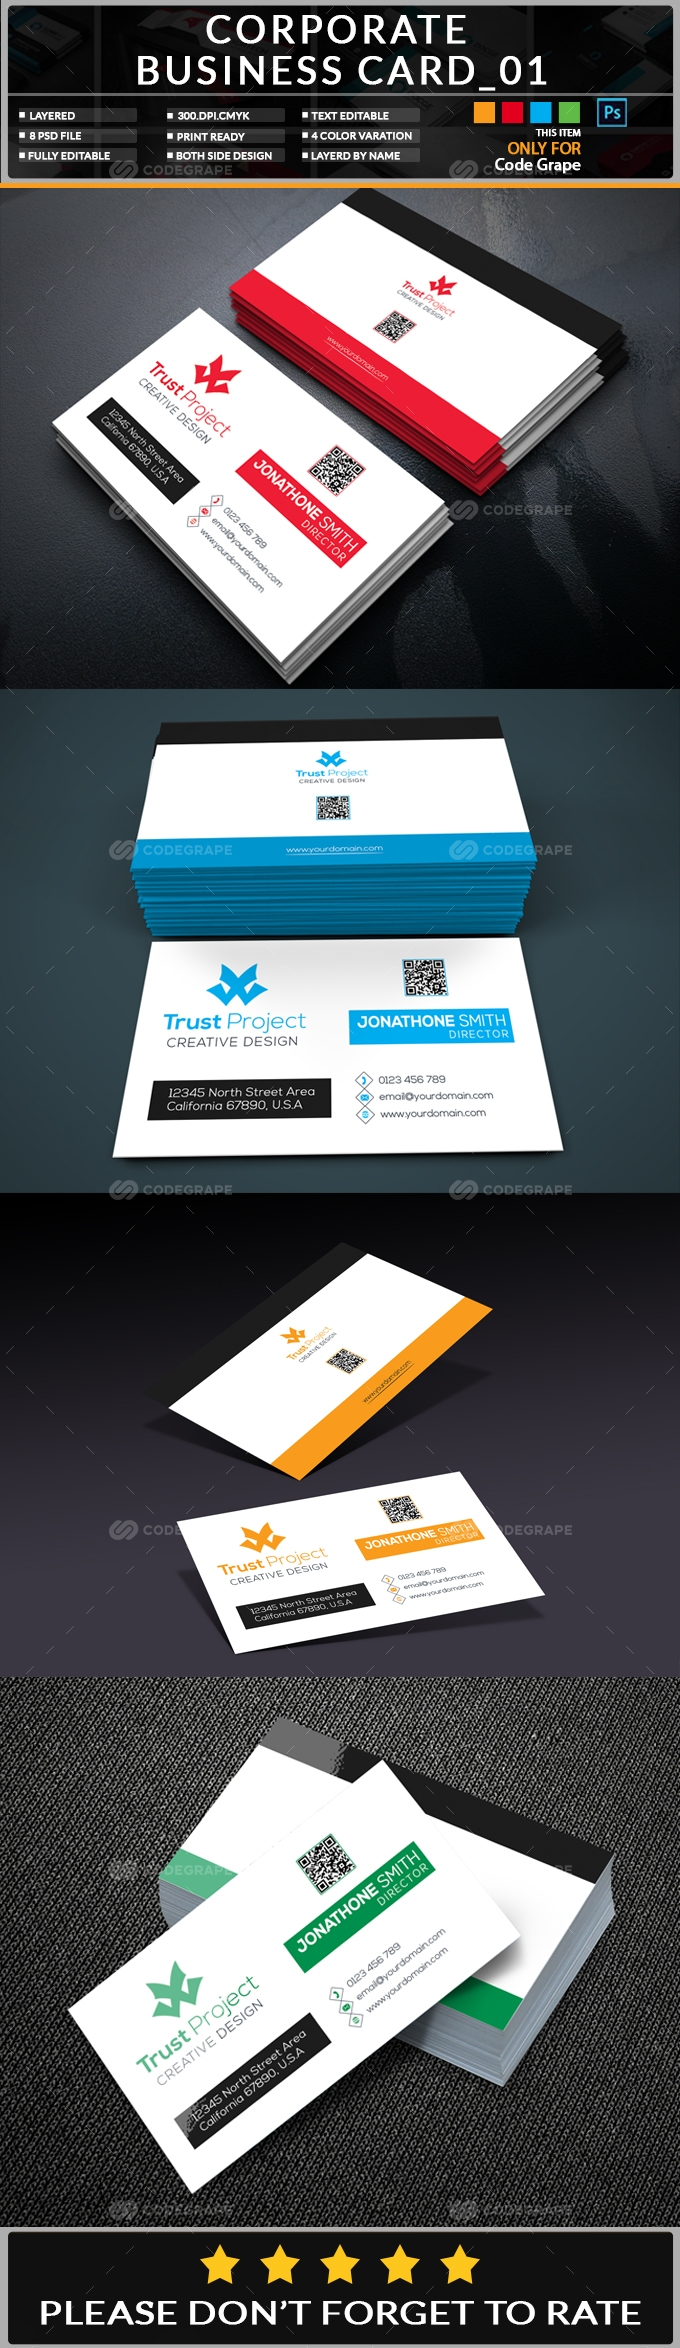 Corporate Business Card_01